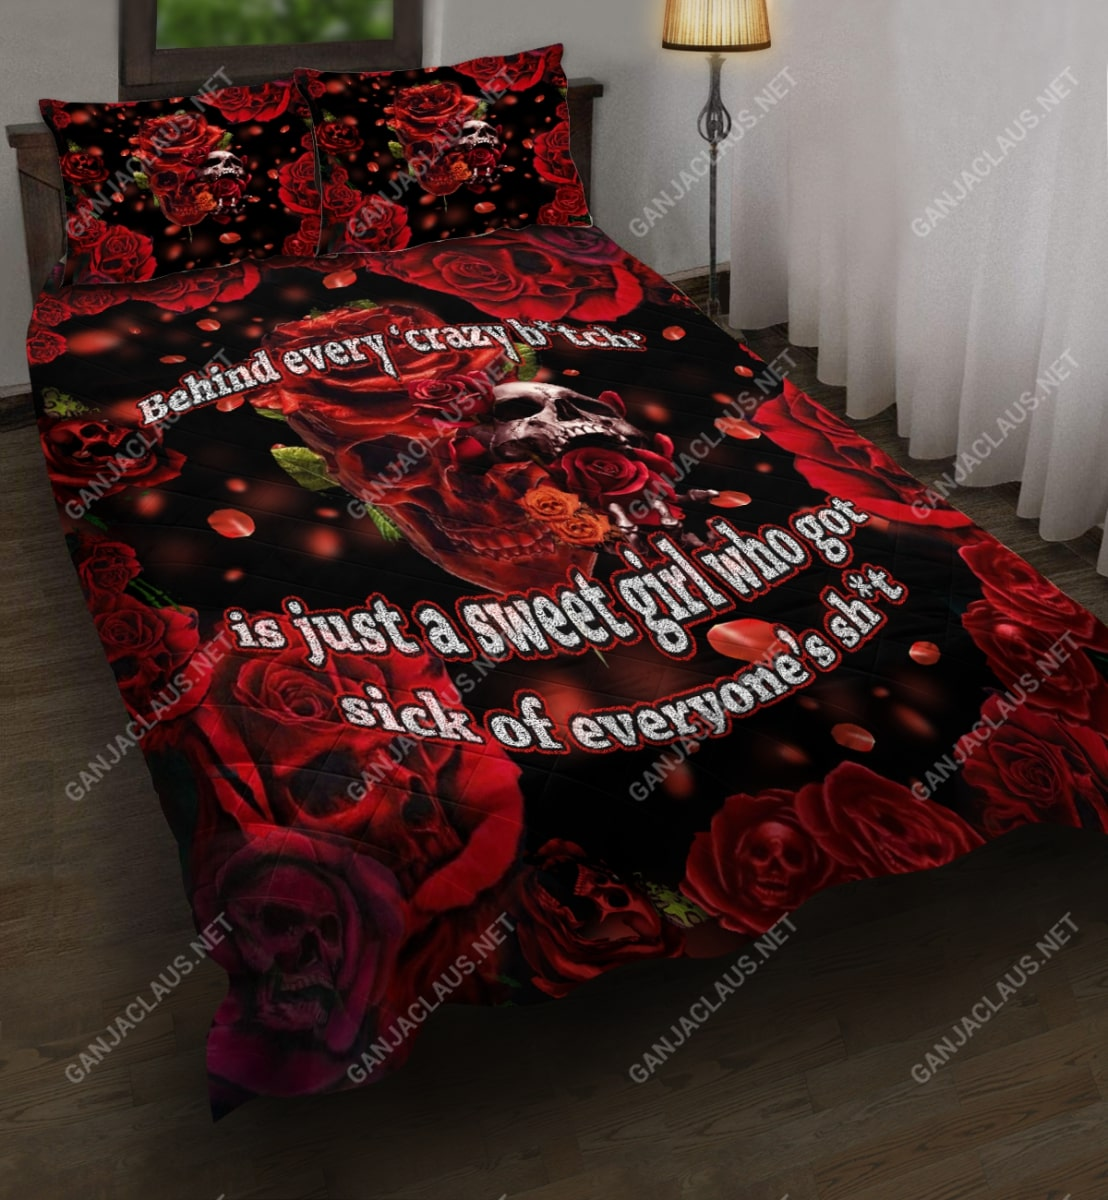 behind every crazy skull roses full printing bedding set 5